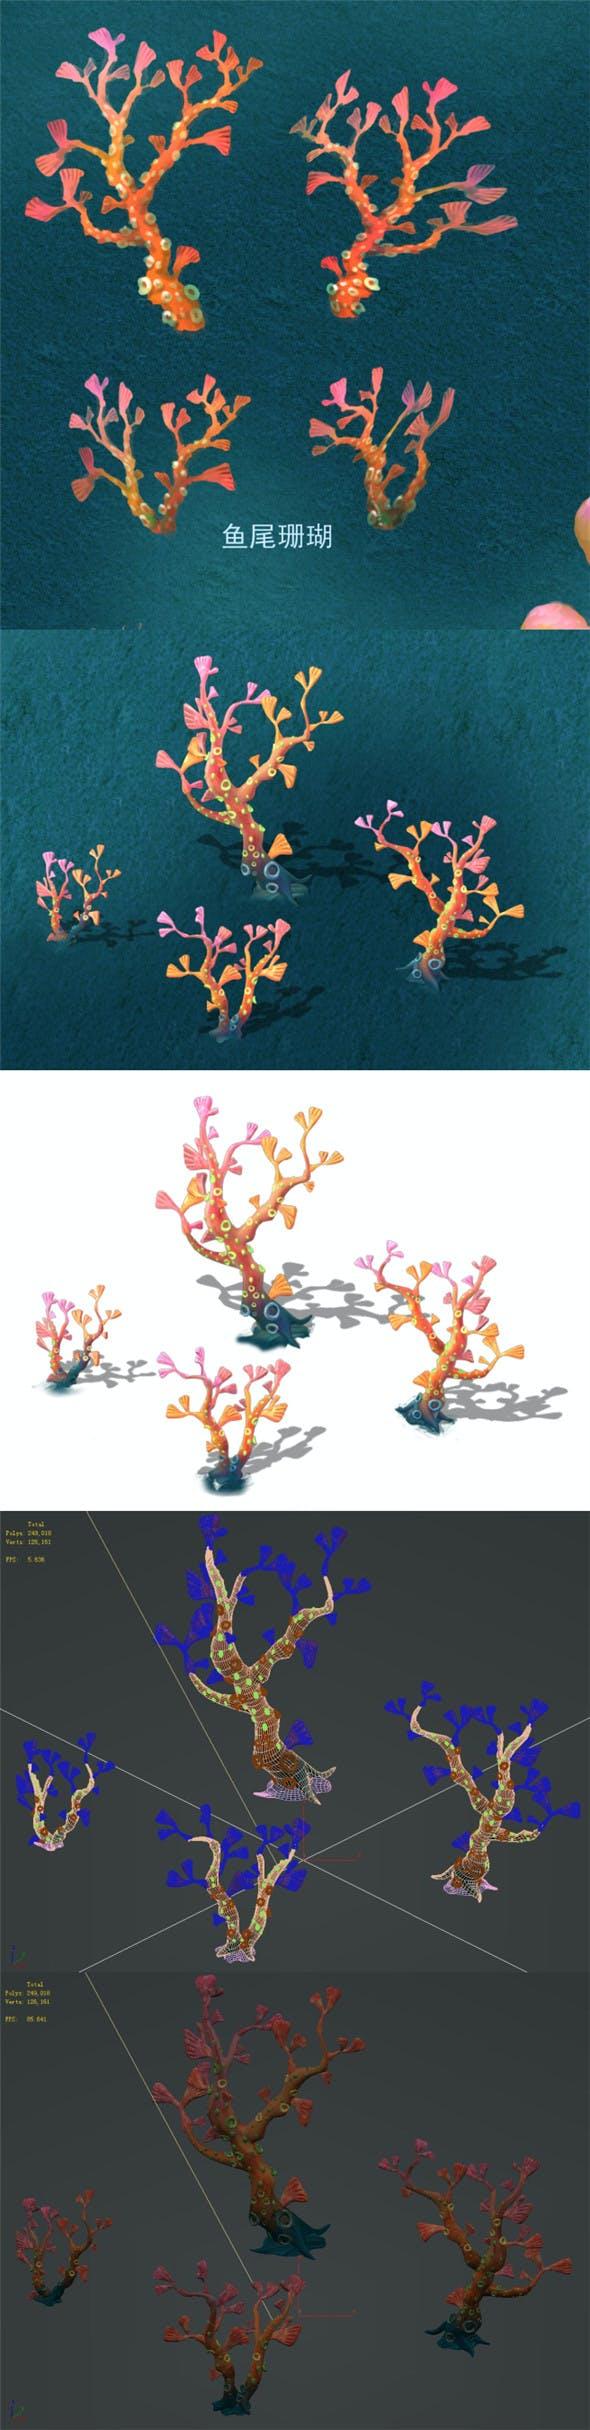 Submarine Cartoon World - Fishtail Coral - 3DOcean Item for Sale